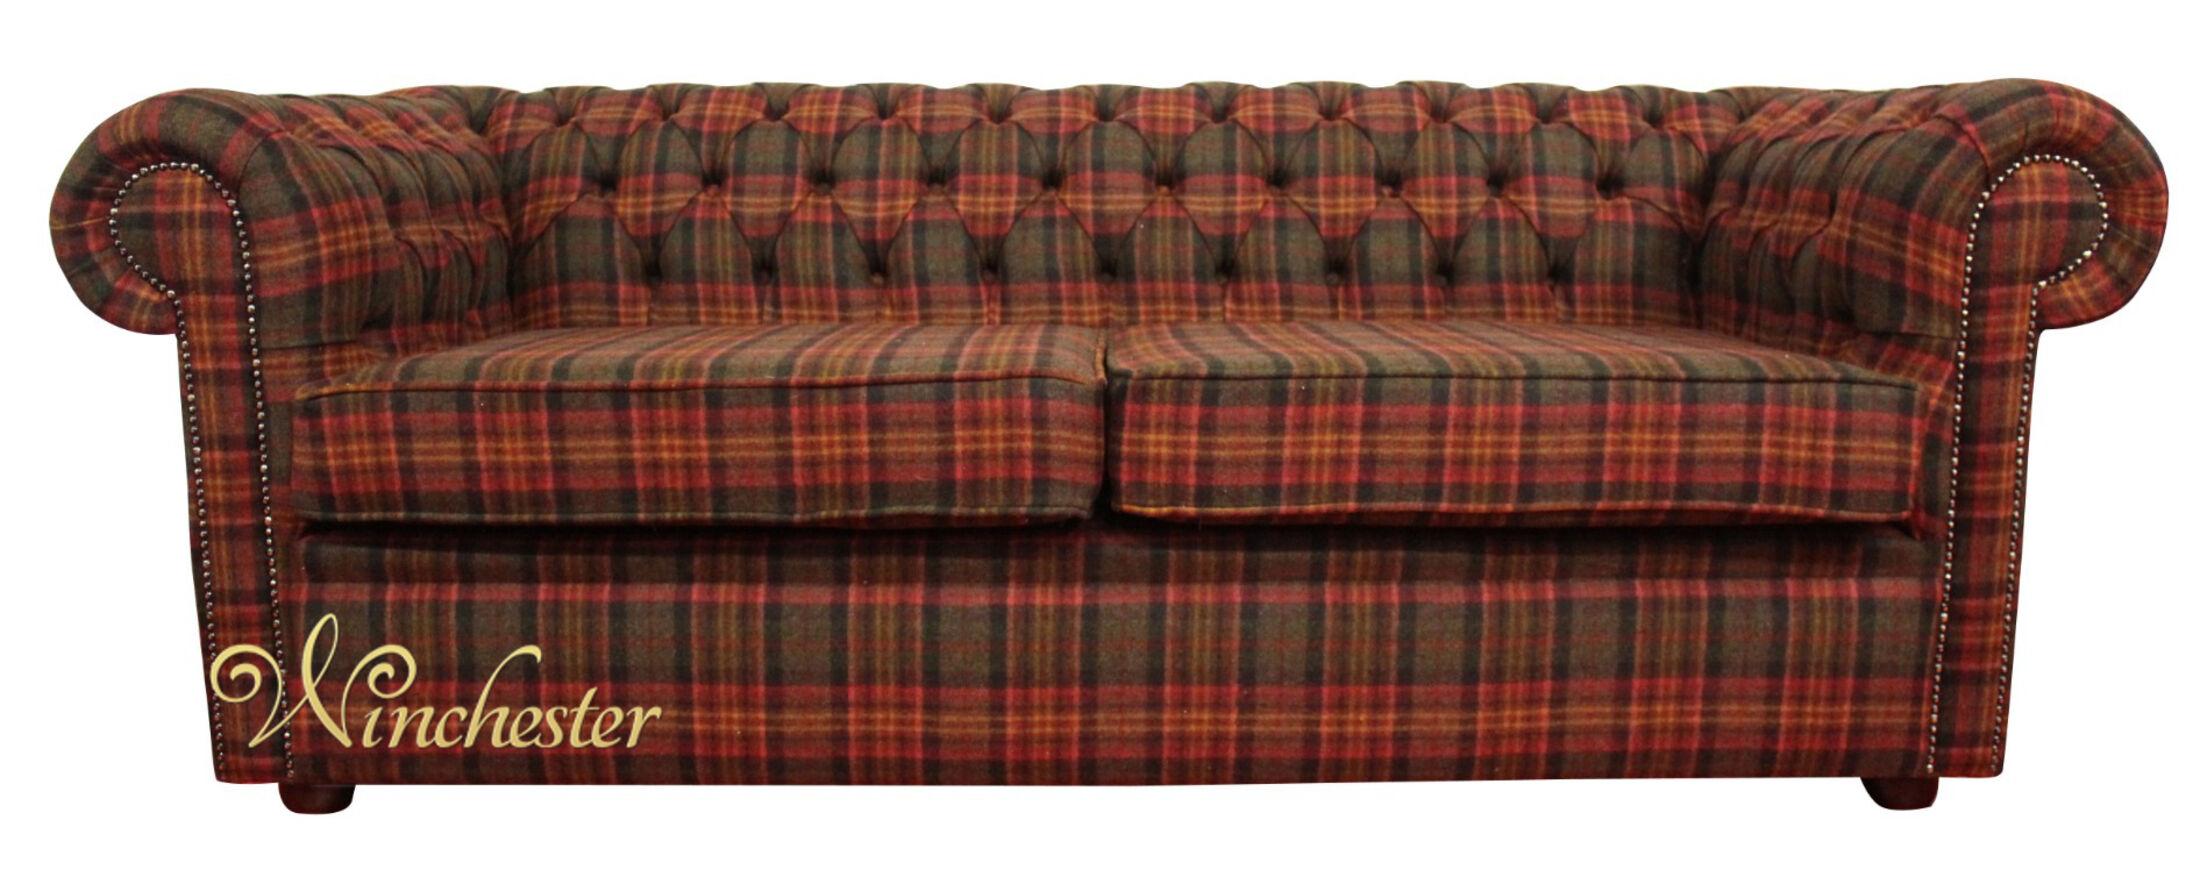 ... Chesterfield Arnold Wool Tweed 3 Seater Sofa Settee